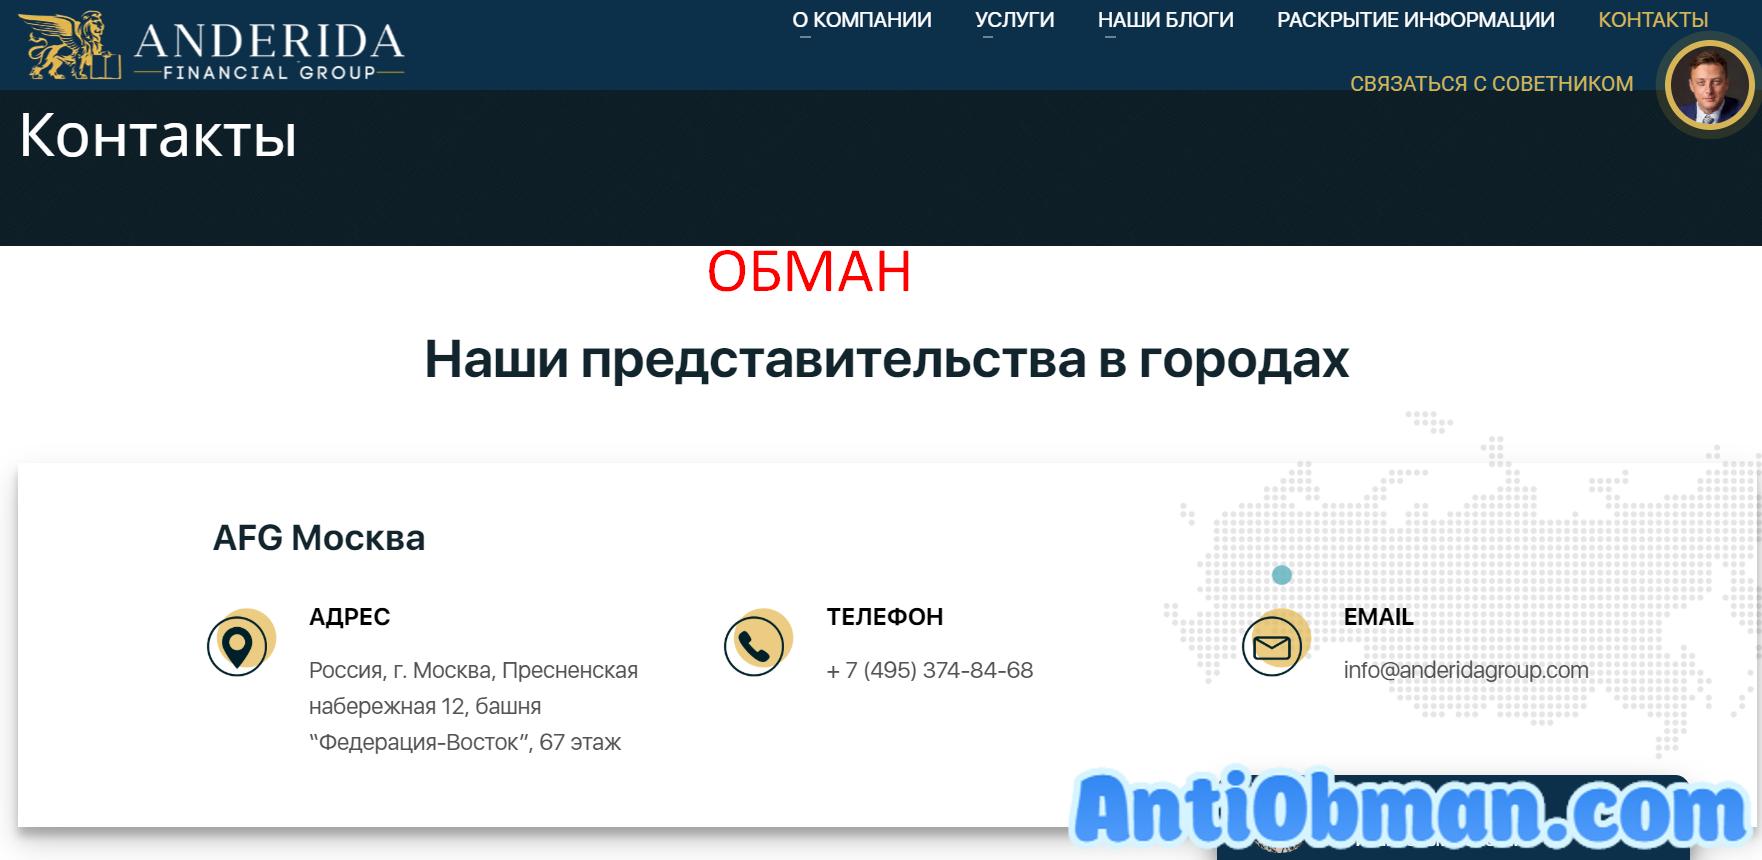 Anderida Financial Group (anderidagroup.com) - отзывы. Честный проект?